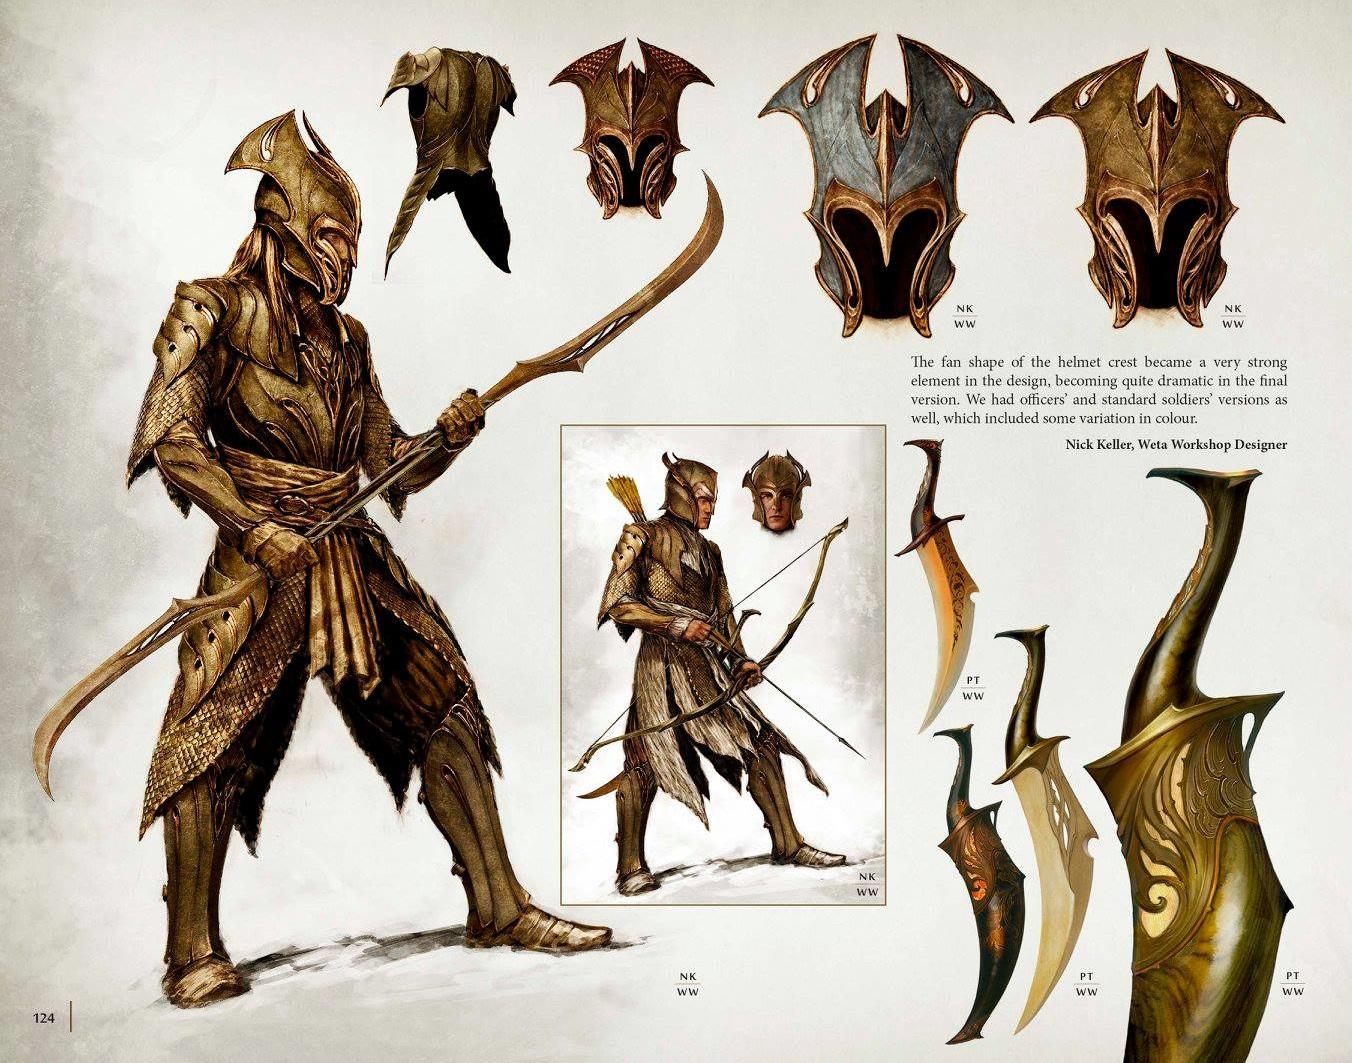 Woodland Warriors 3 Image Woodlandguard Mod Db